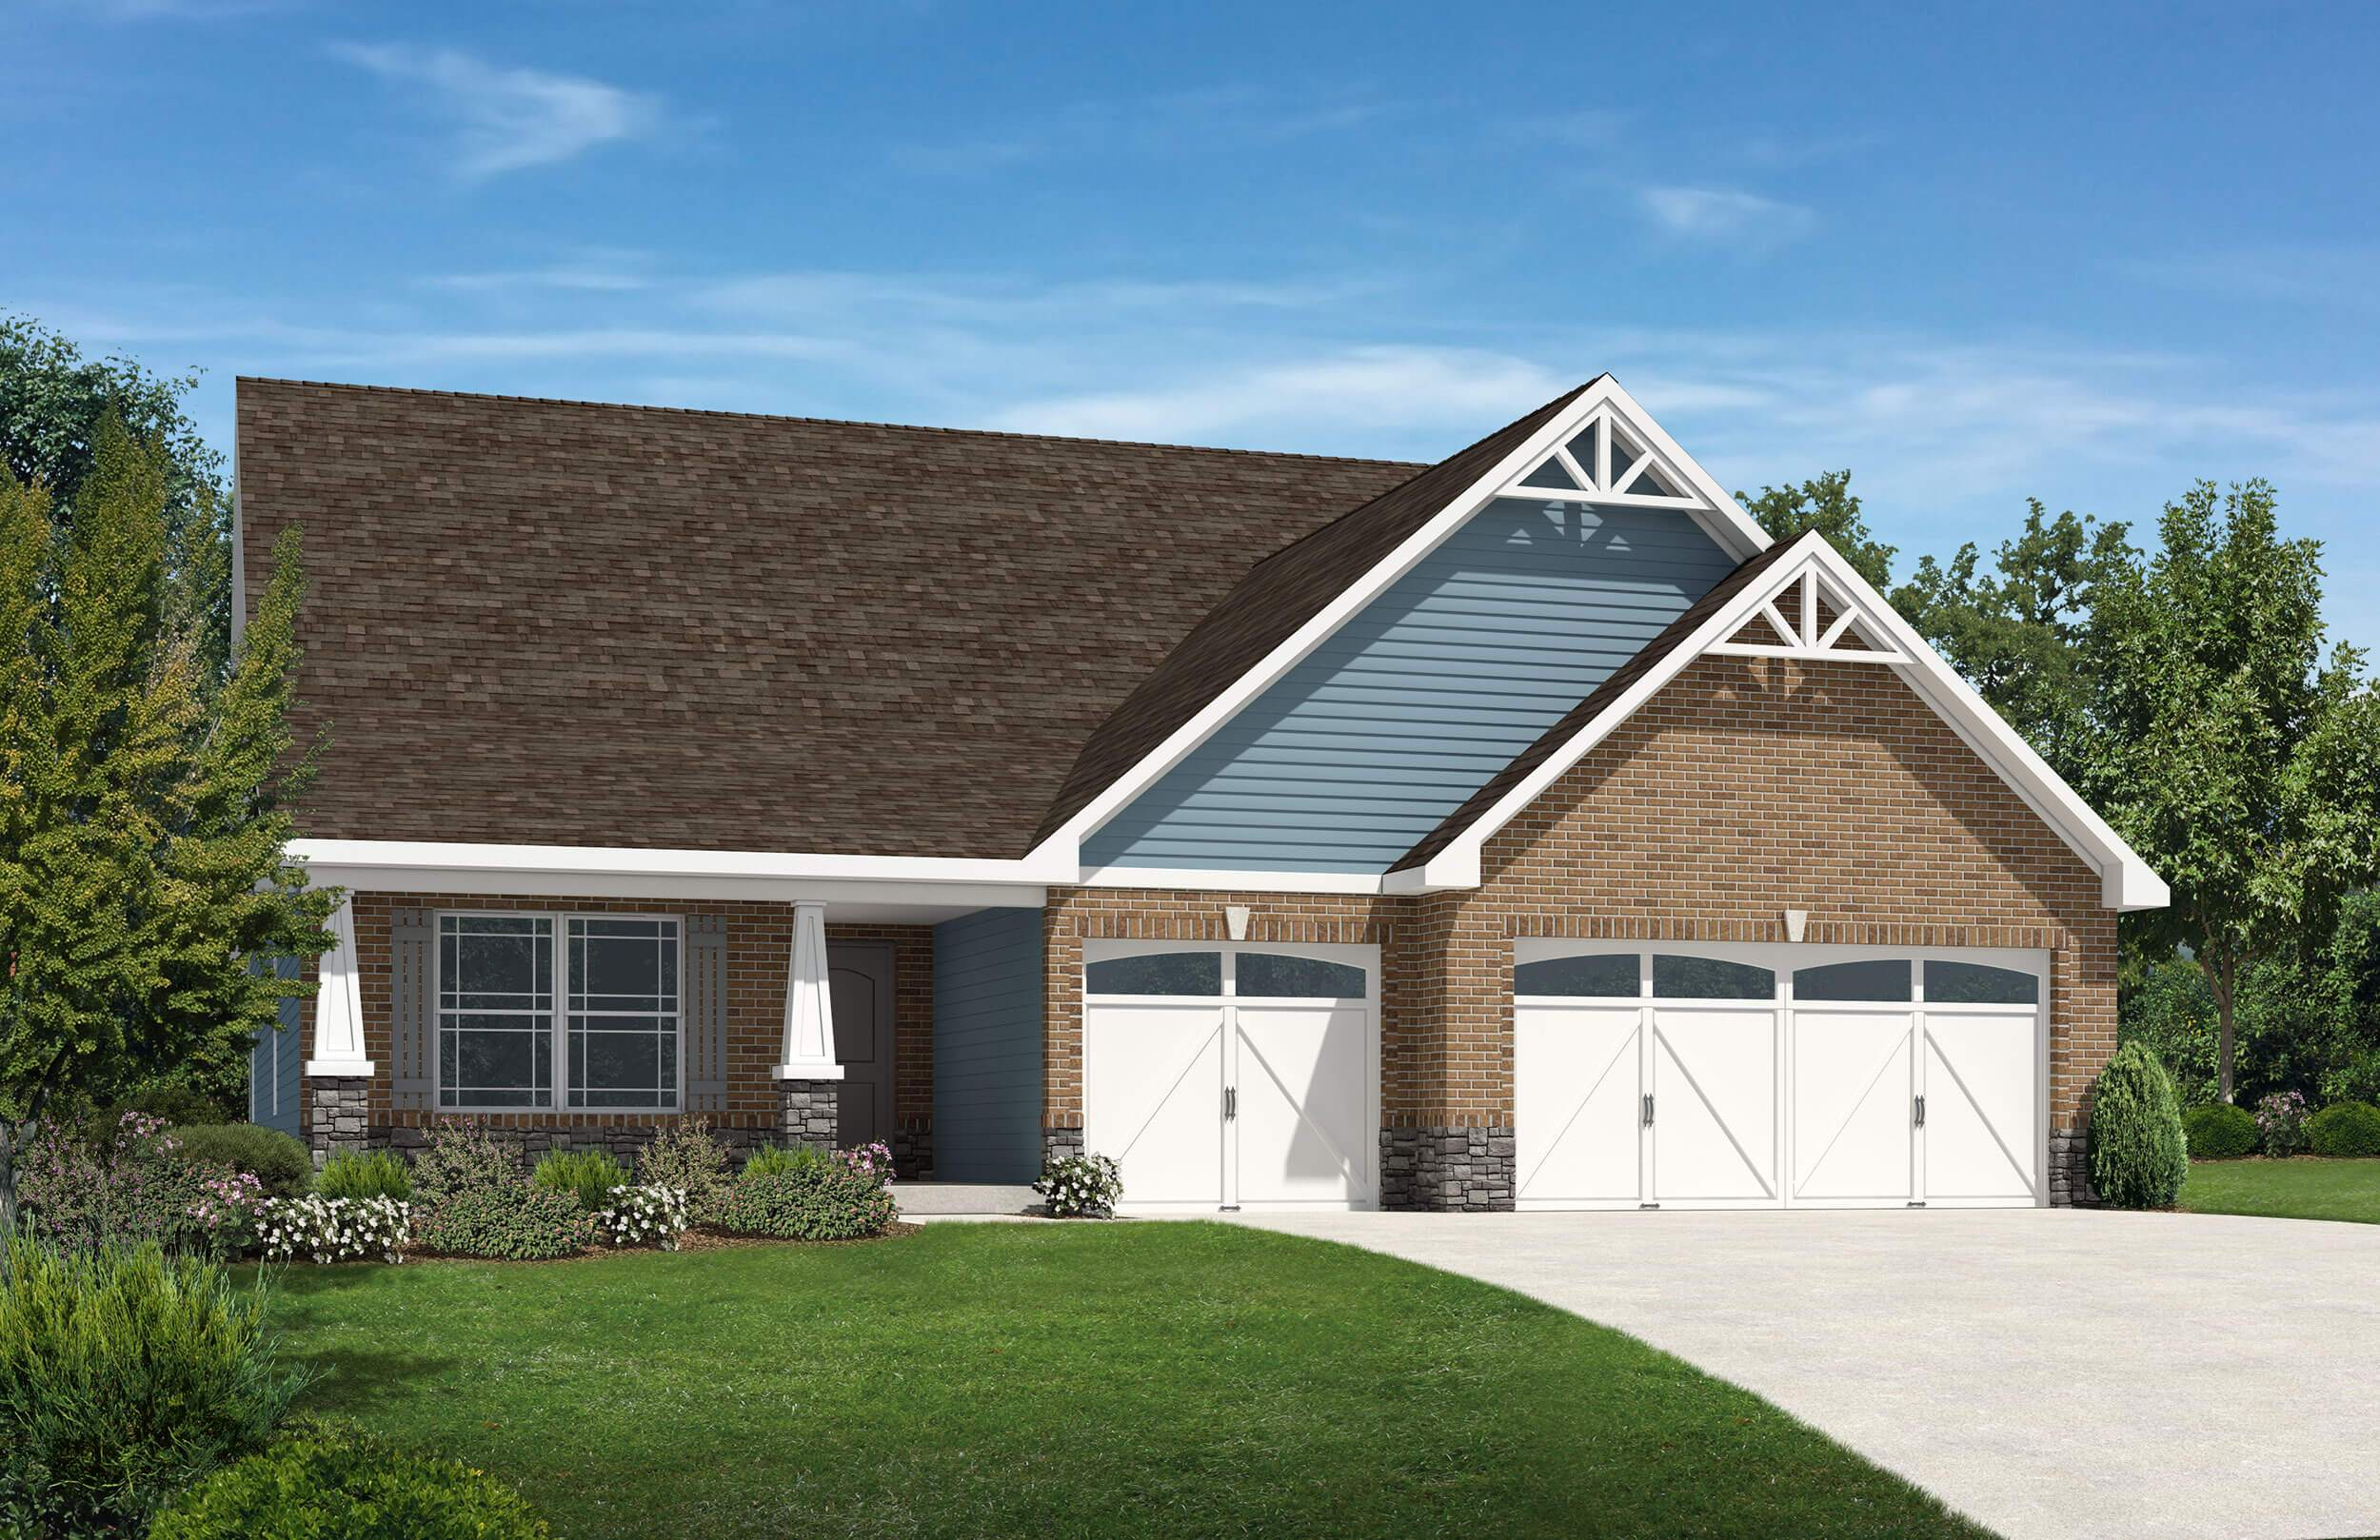 Grandover-Design-at-Village at New Bethel-in-Indianapolis